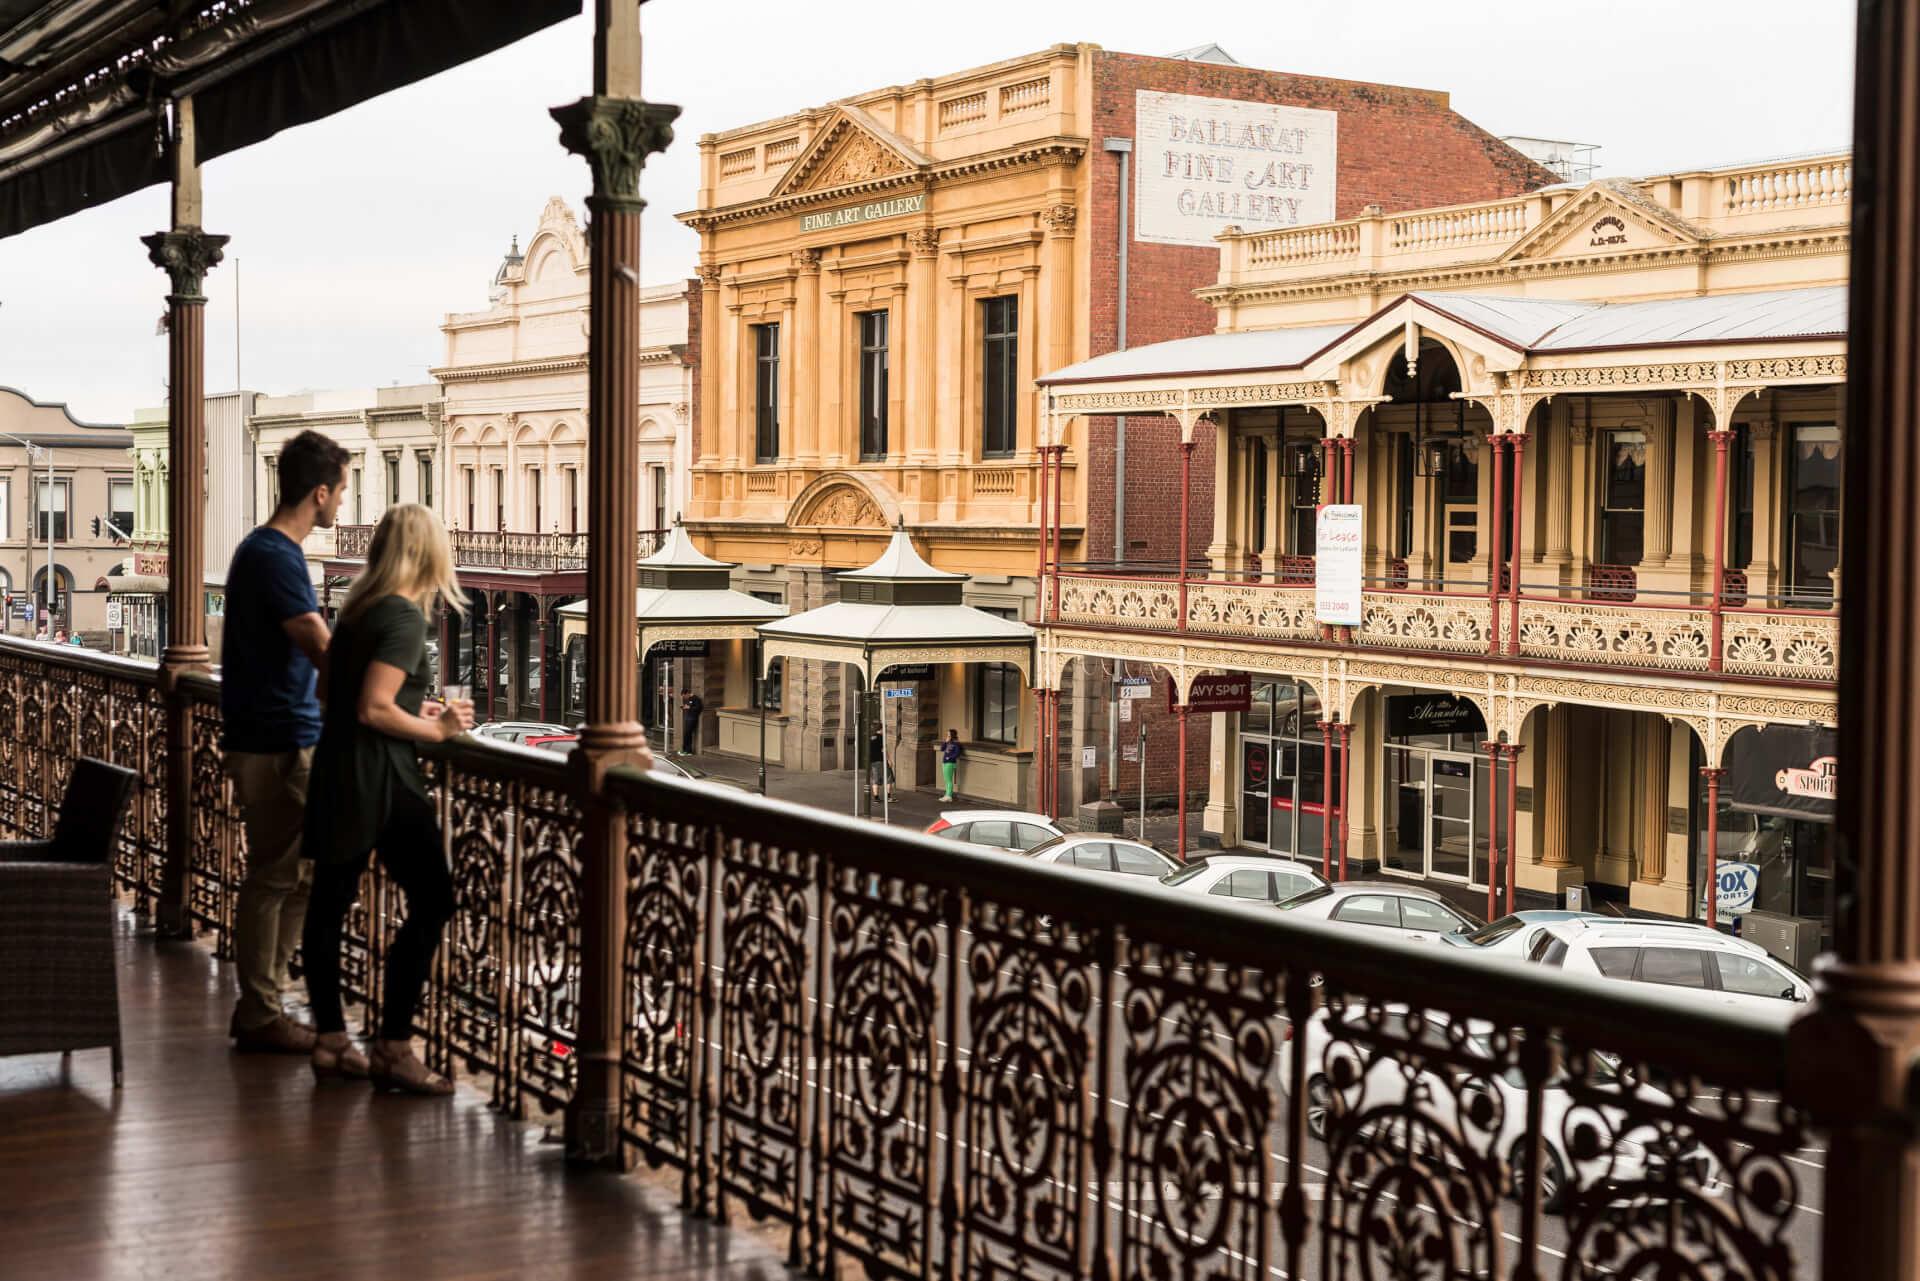 Melbourne Private Tours Ballarat Lydiard St